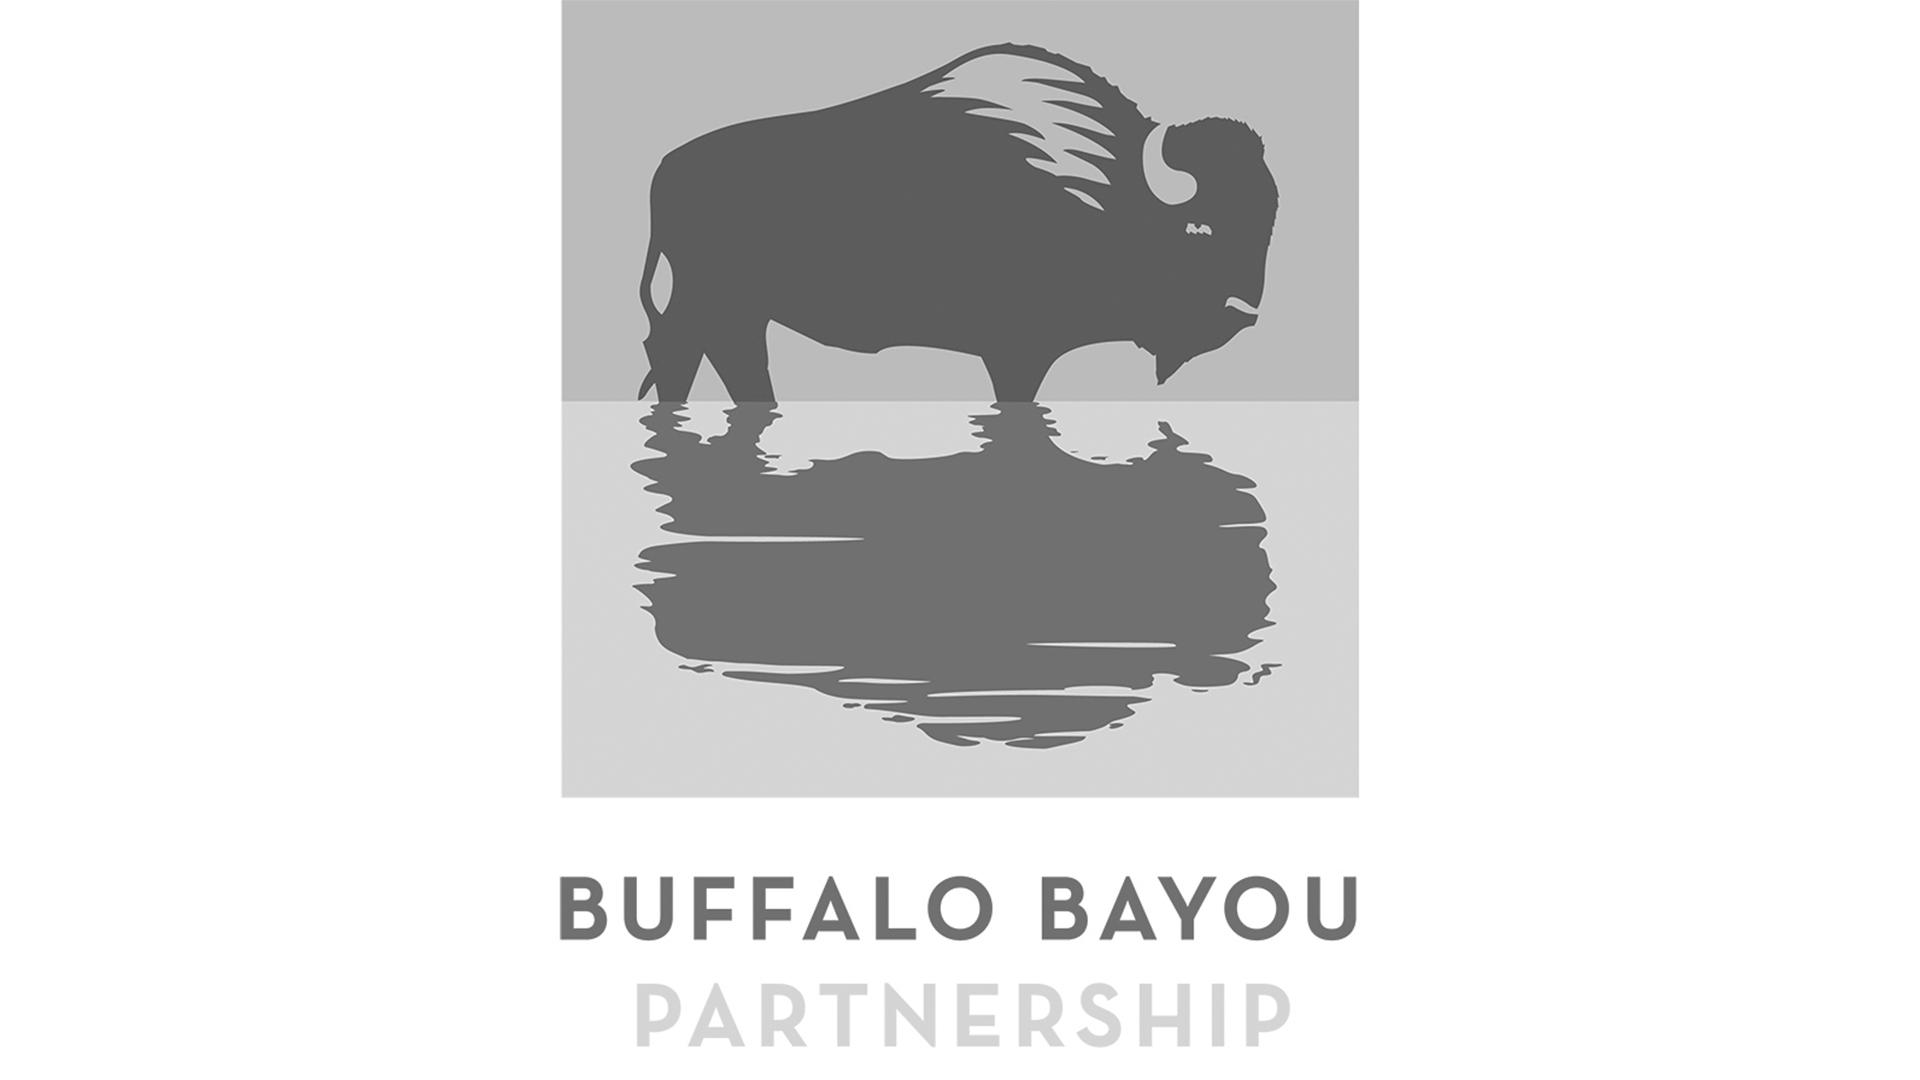 Buffalo Bayou Partnership_Partner_1920x1080